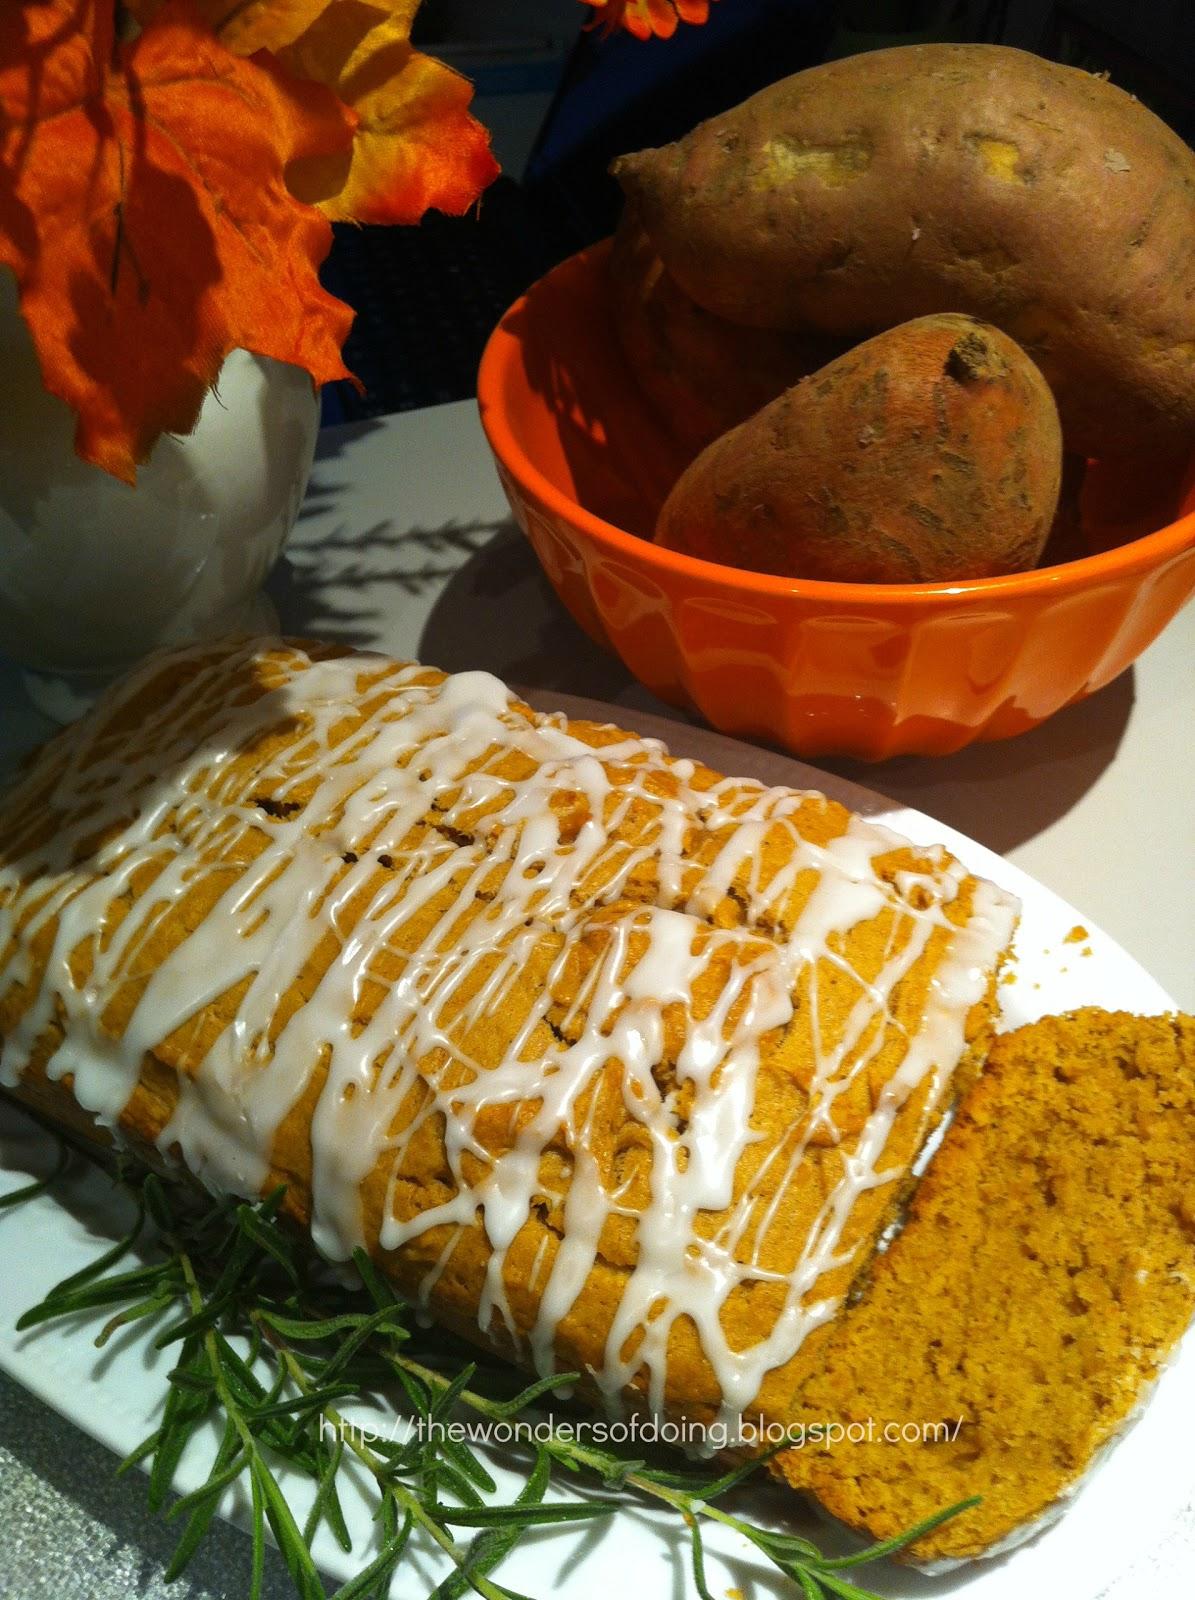 The Wonders of Doing: Sweet Potato Pound Cake... yummm!